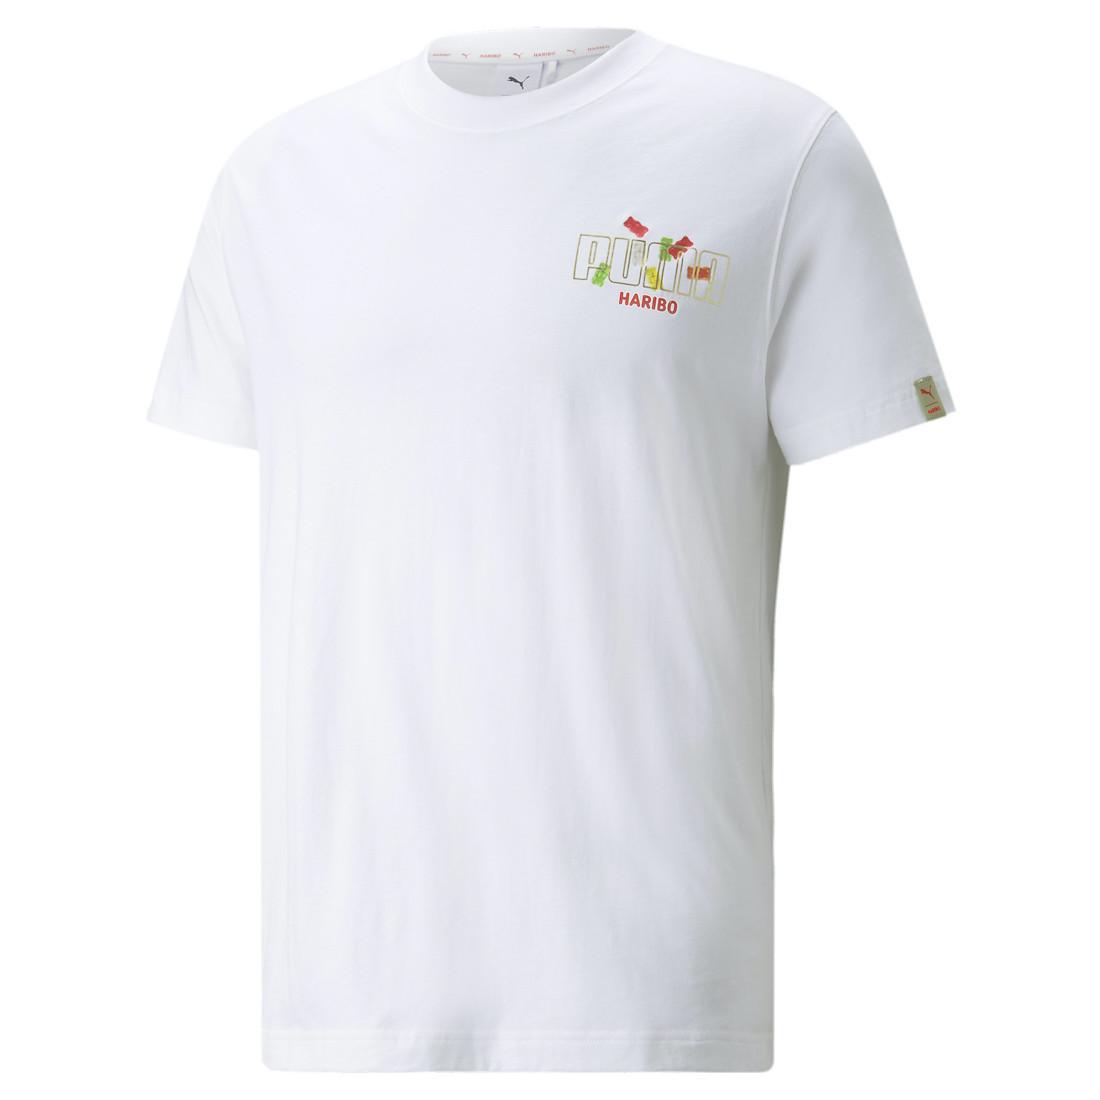 HARIBO Puma Shirts